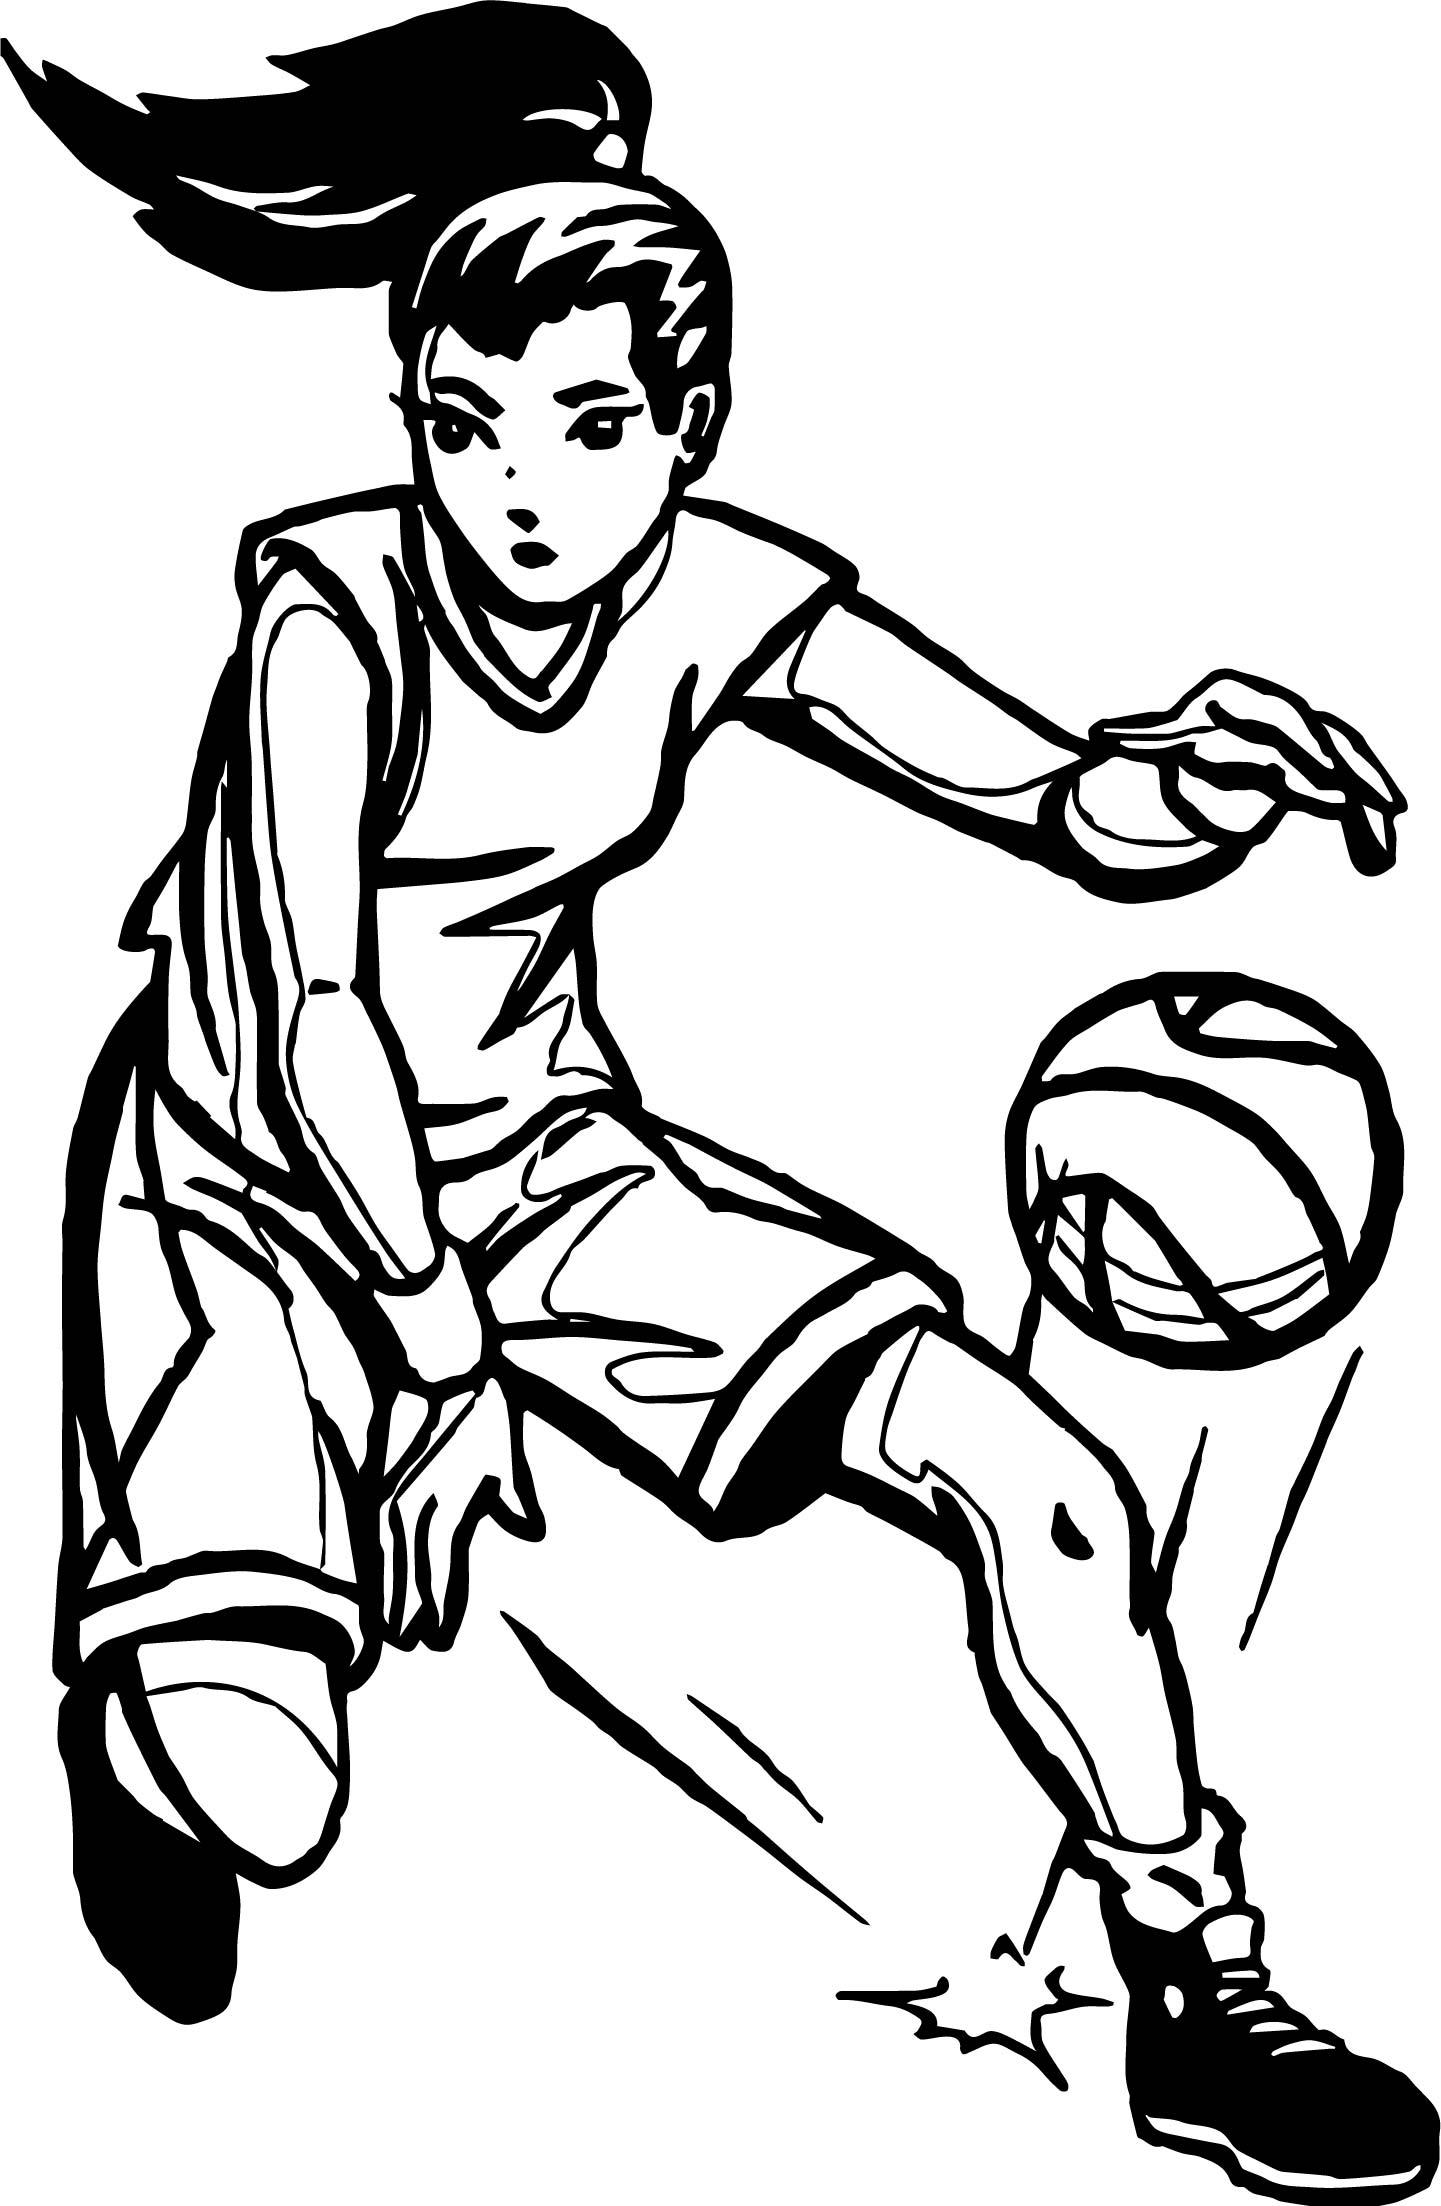 Girl Player Playing Basketball Coloring Page